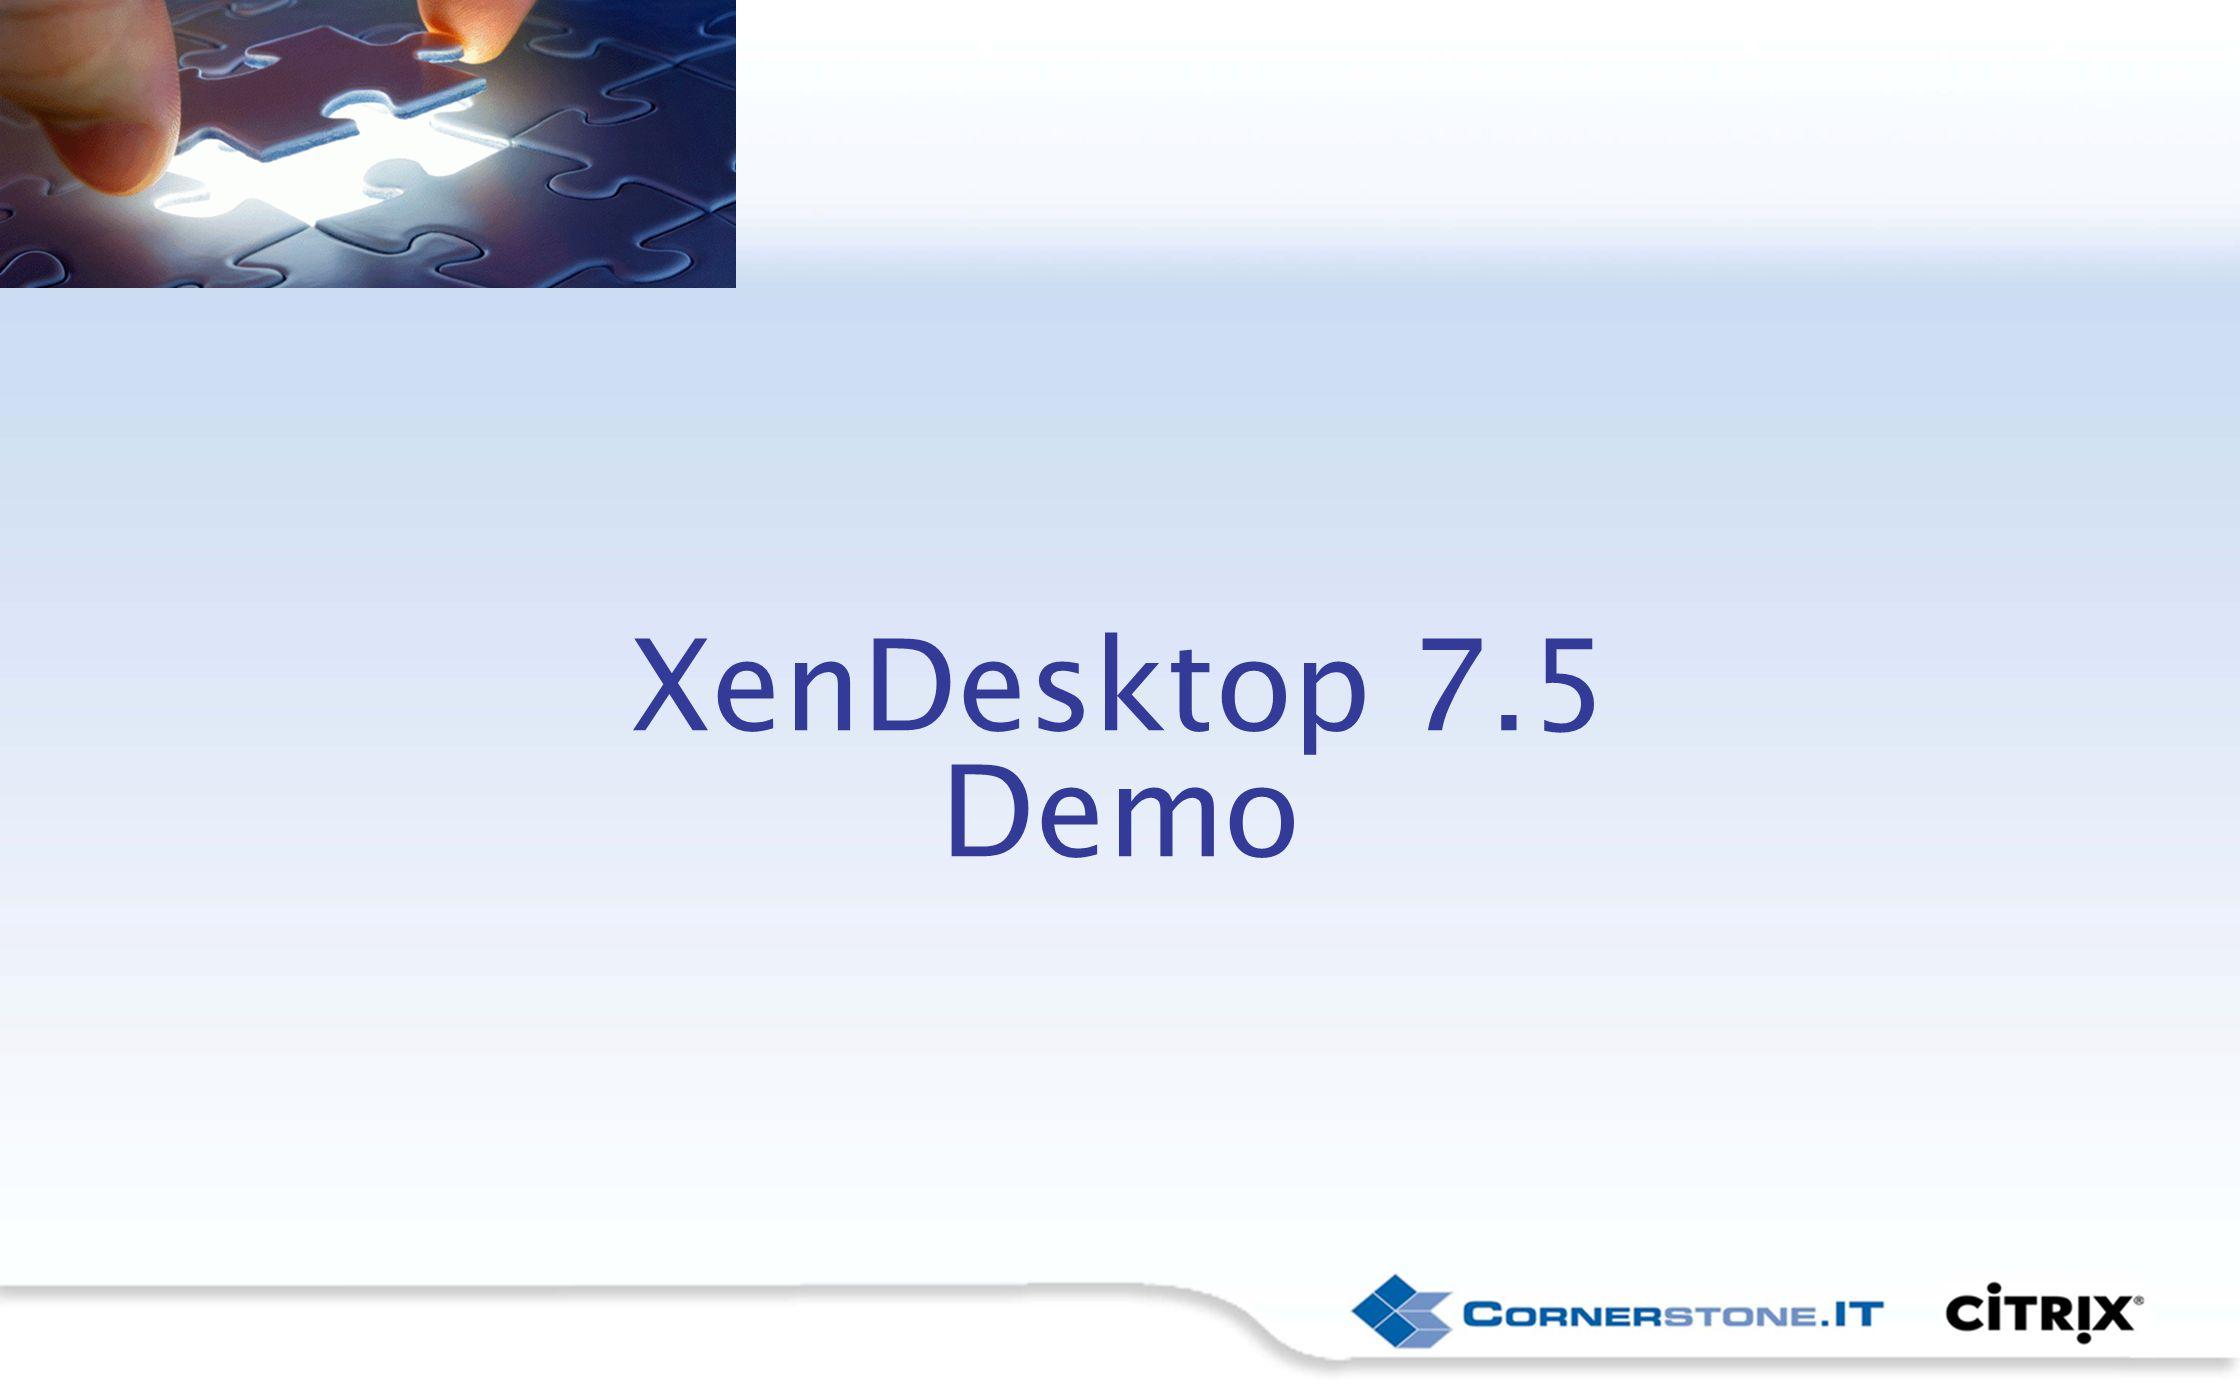 XenDesktop 7.5 Demo